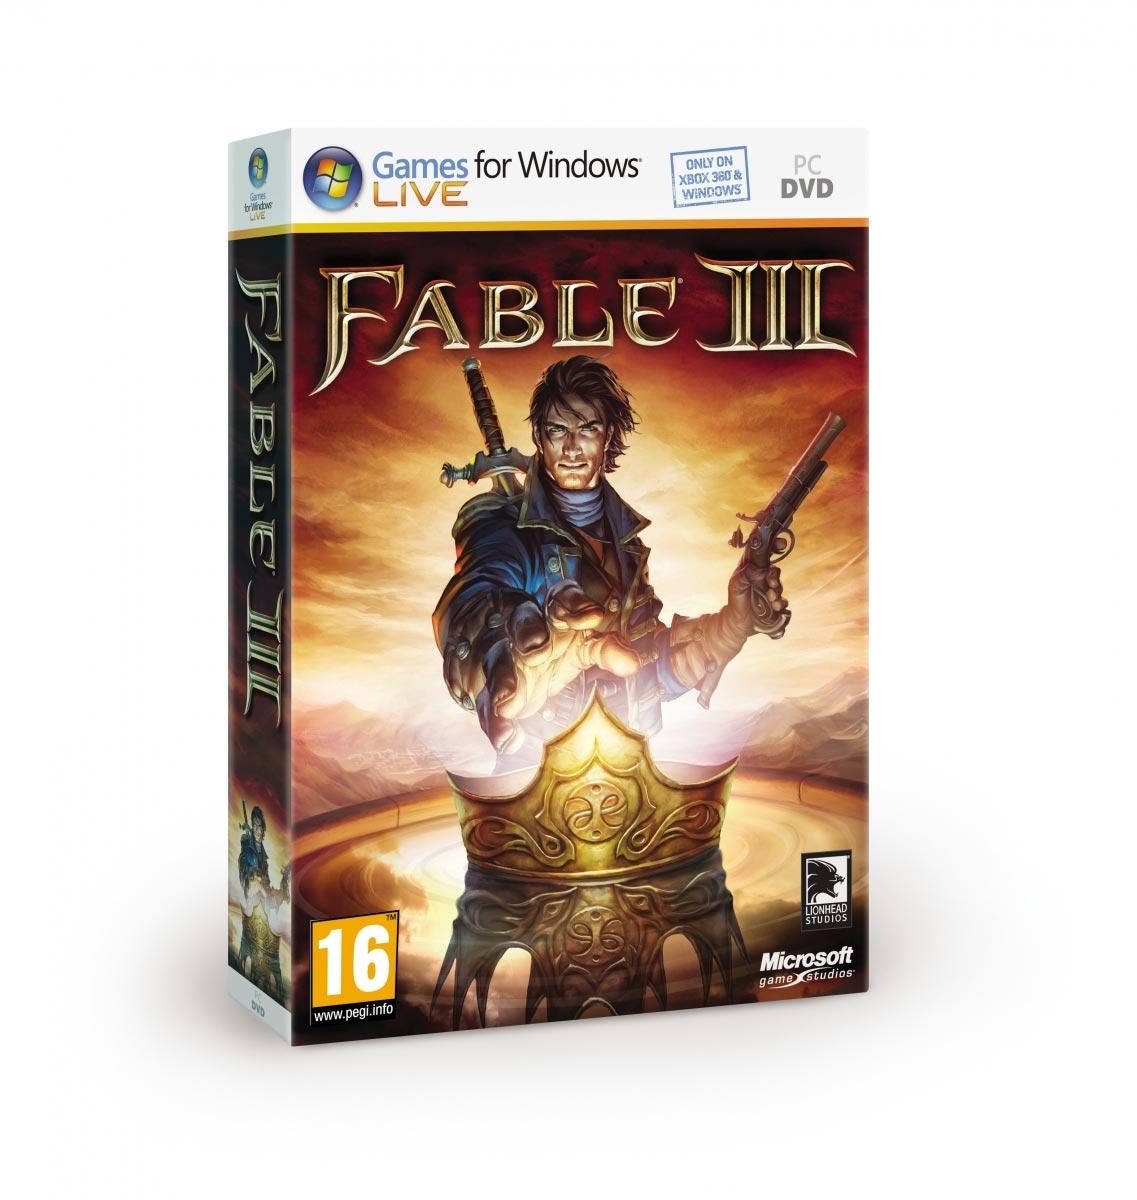 box-dvd-fable3.jpg